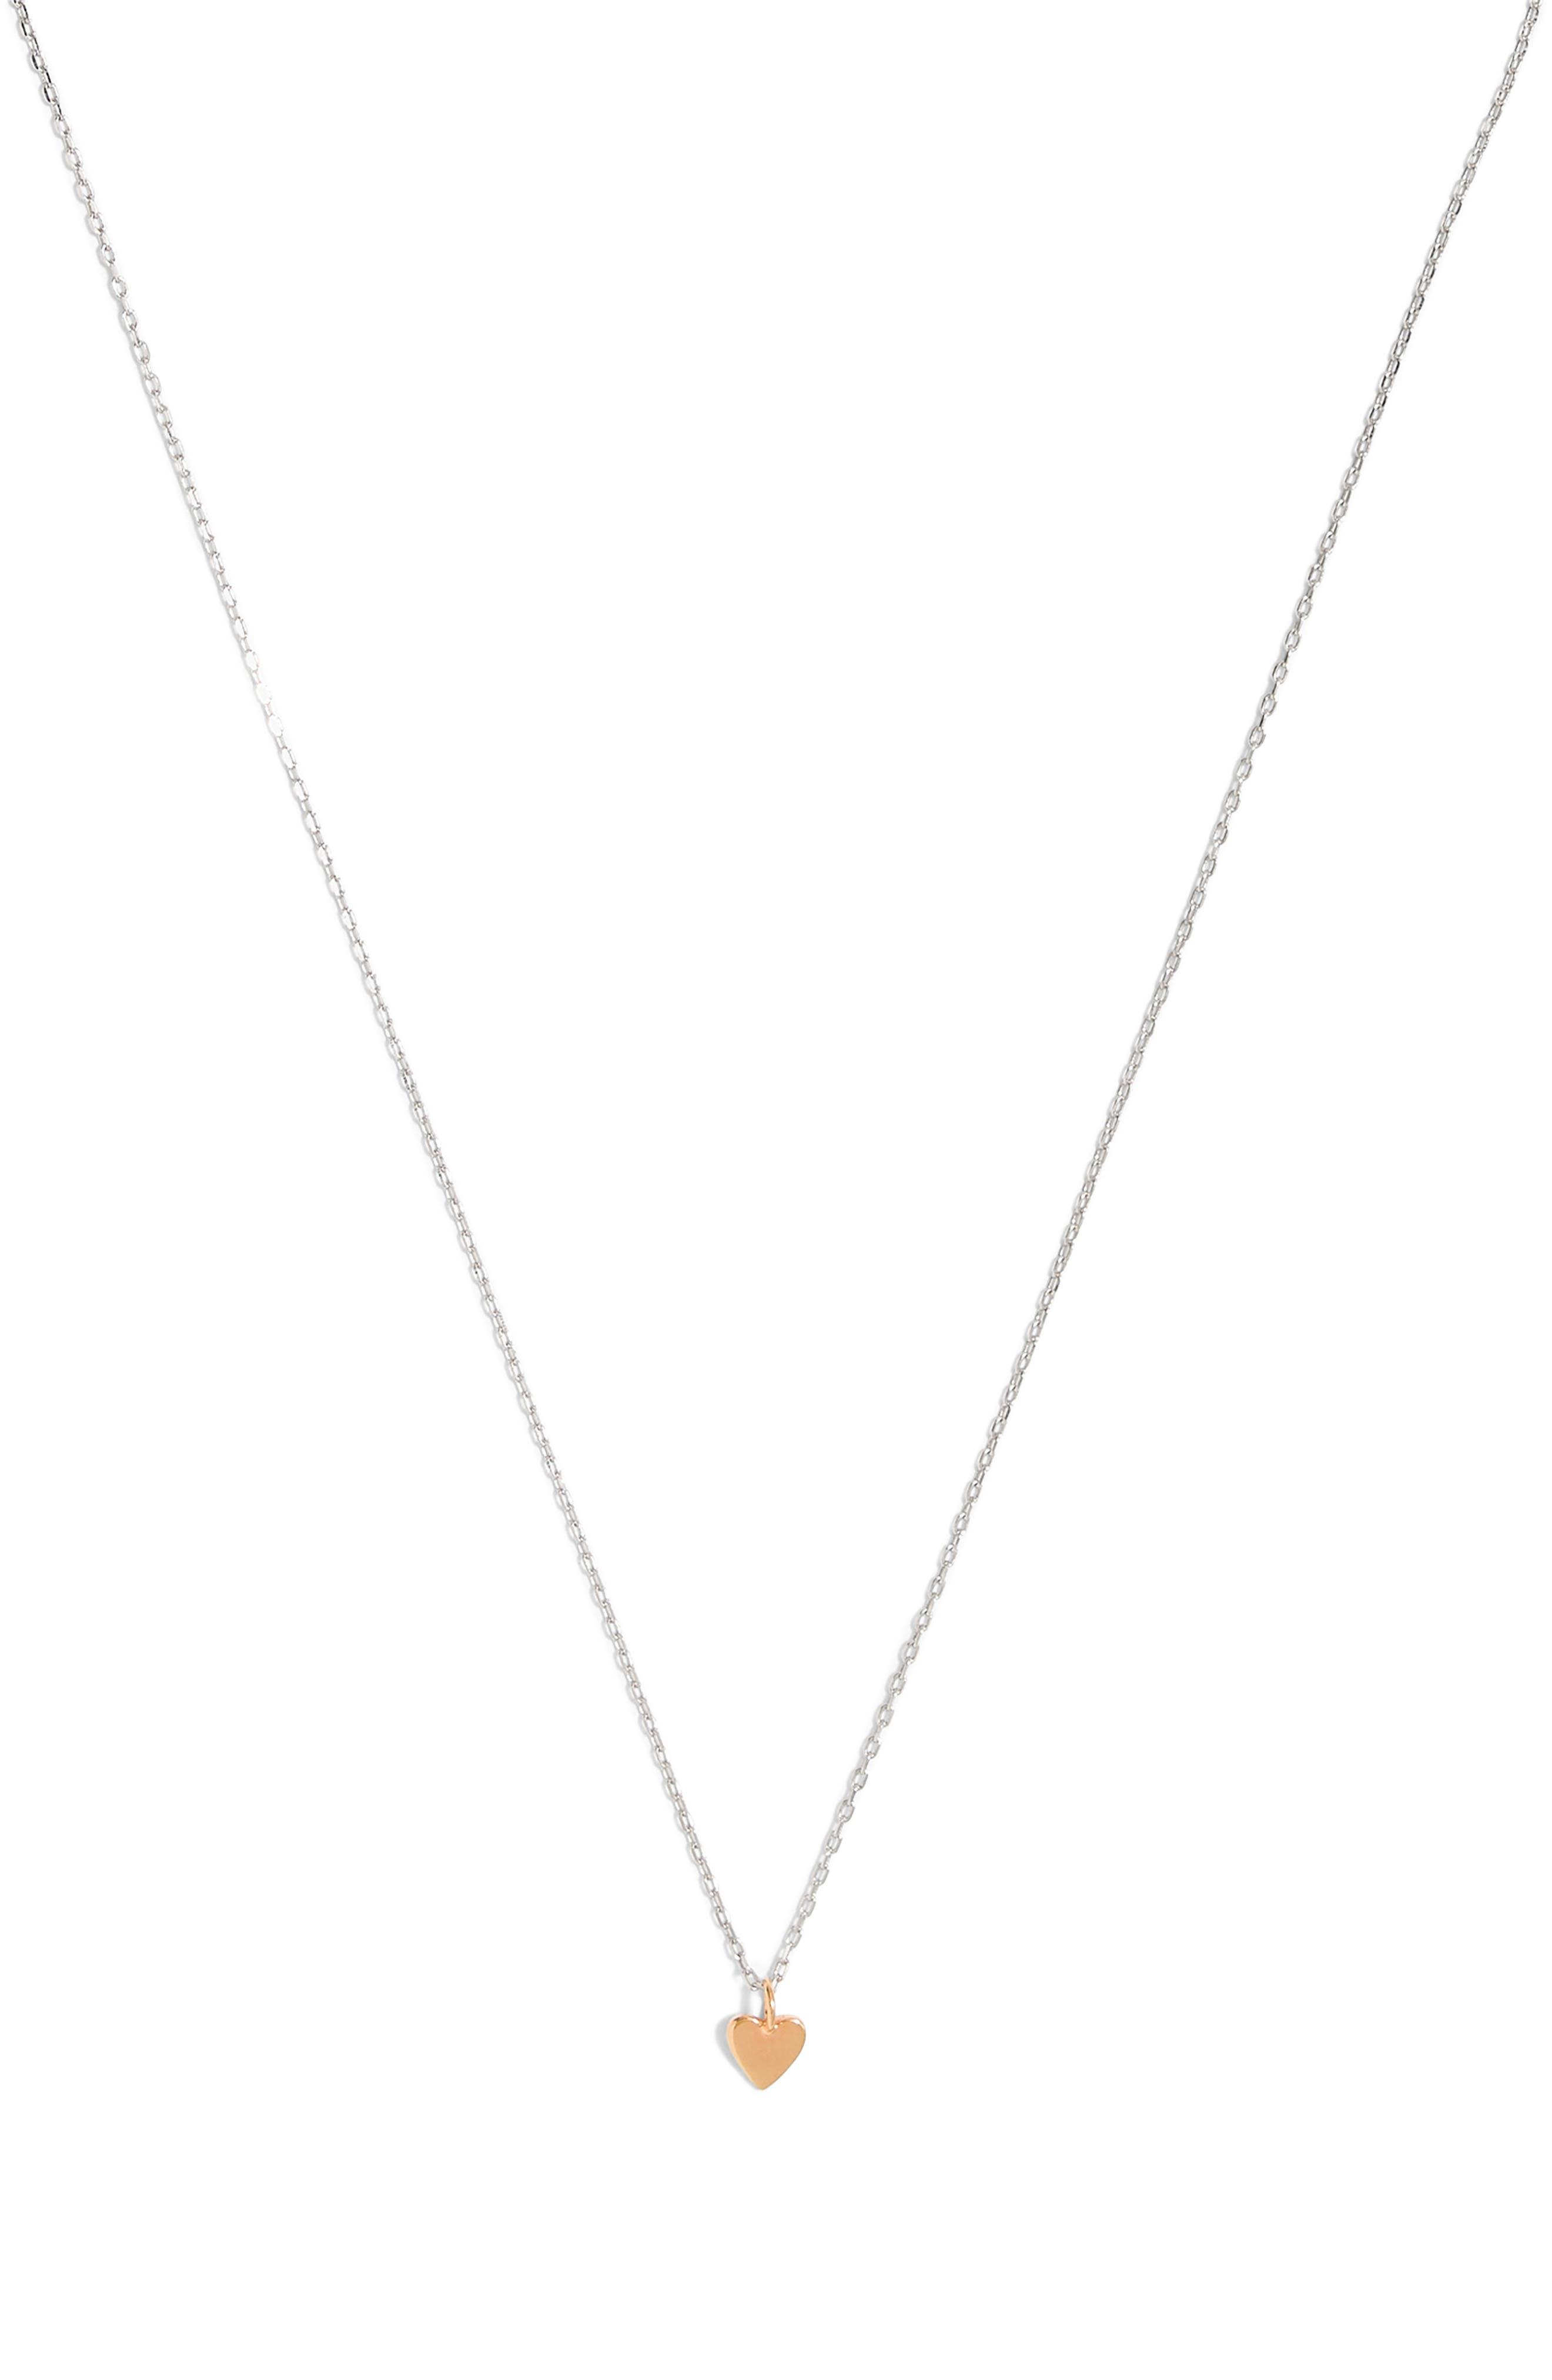 MADEWELL Vermeil Pendant Necklace, Main, color, 710